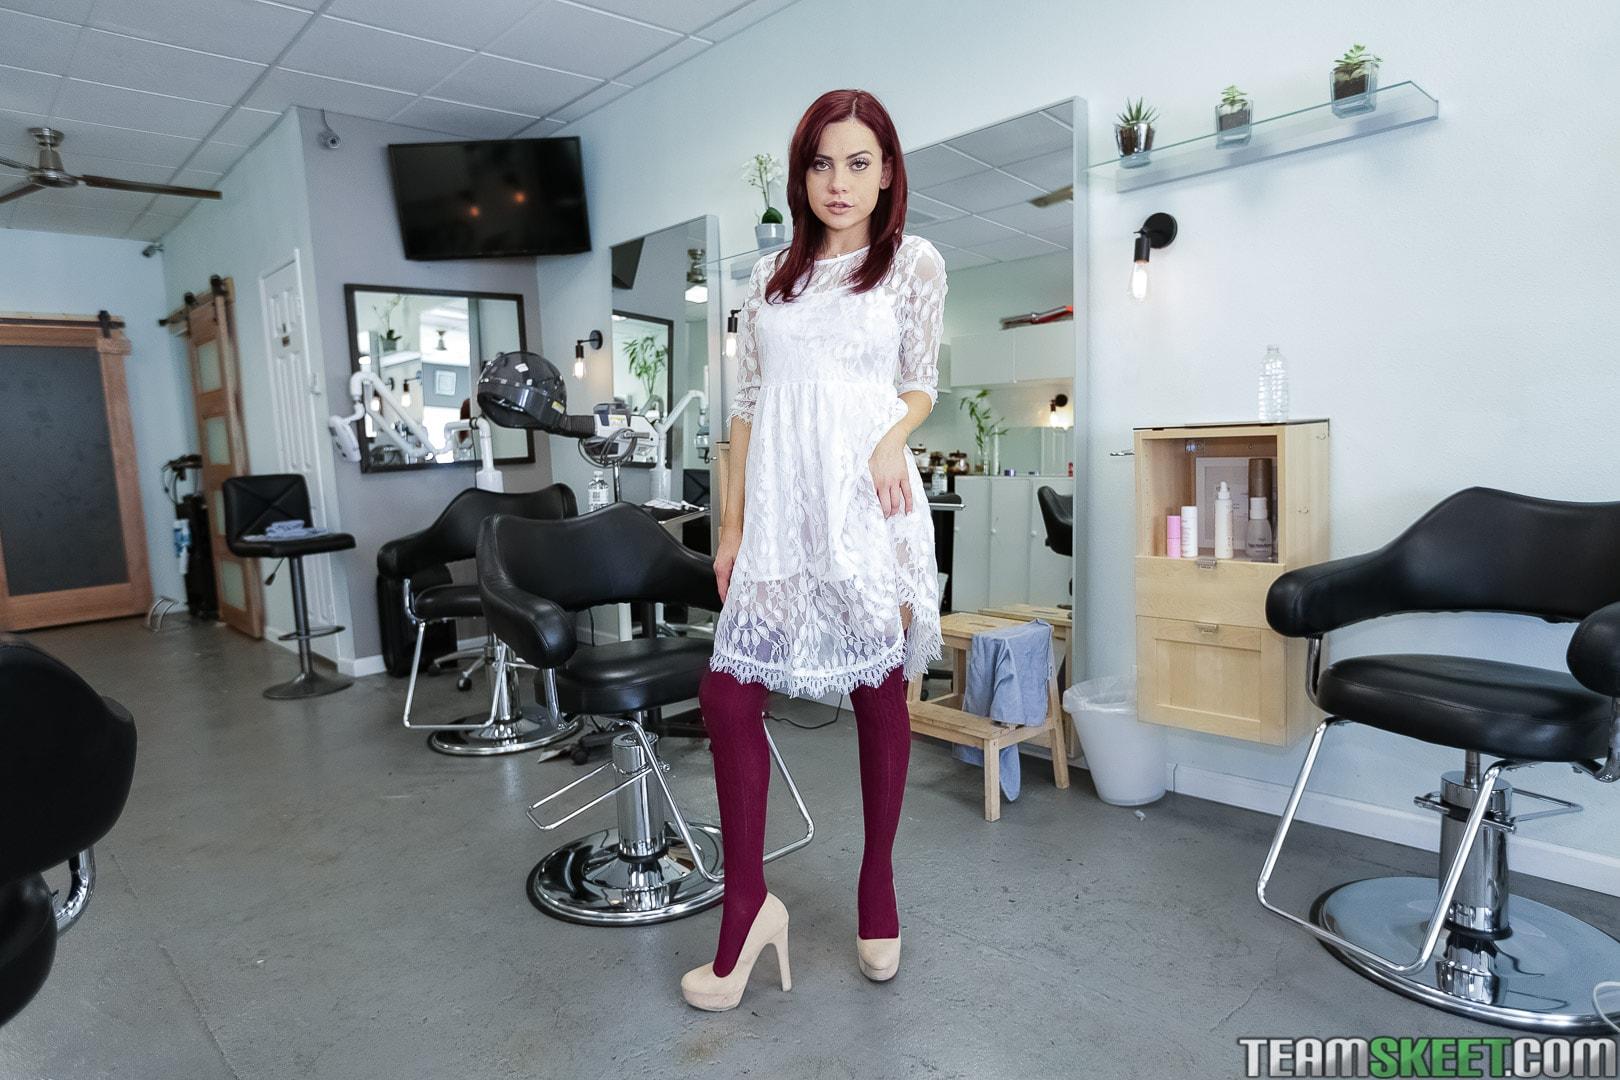 Team Skeet 'Full Service Hair Salon' starring Sabina Rouge (Photo 1)